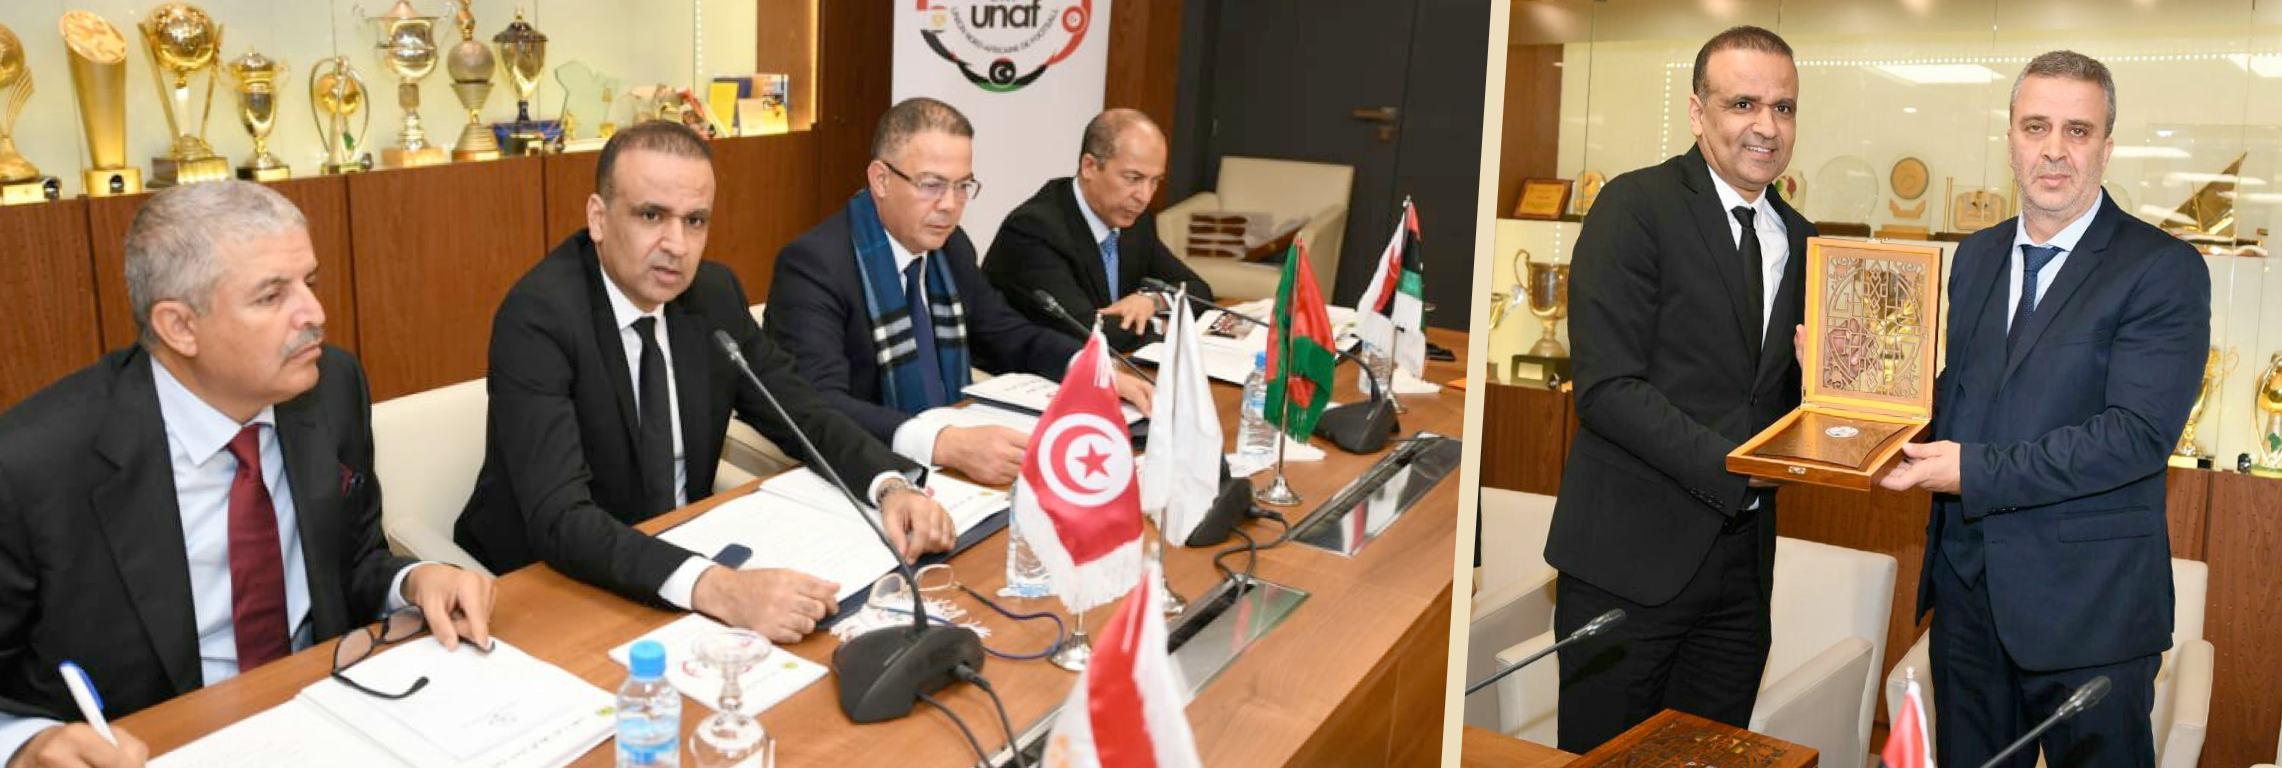 slider unaf nord africaine reunion